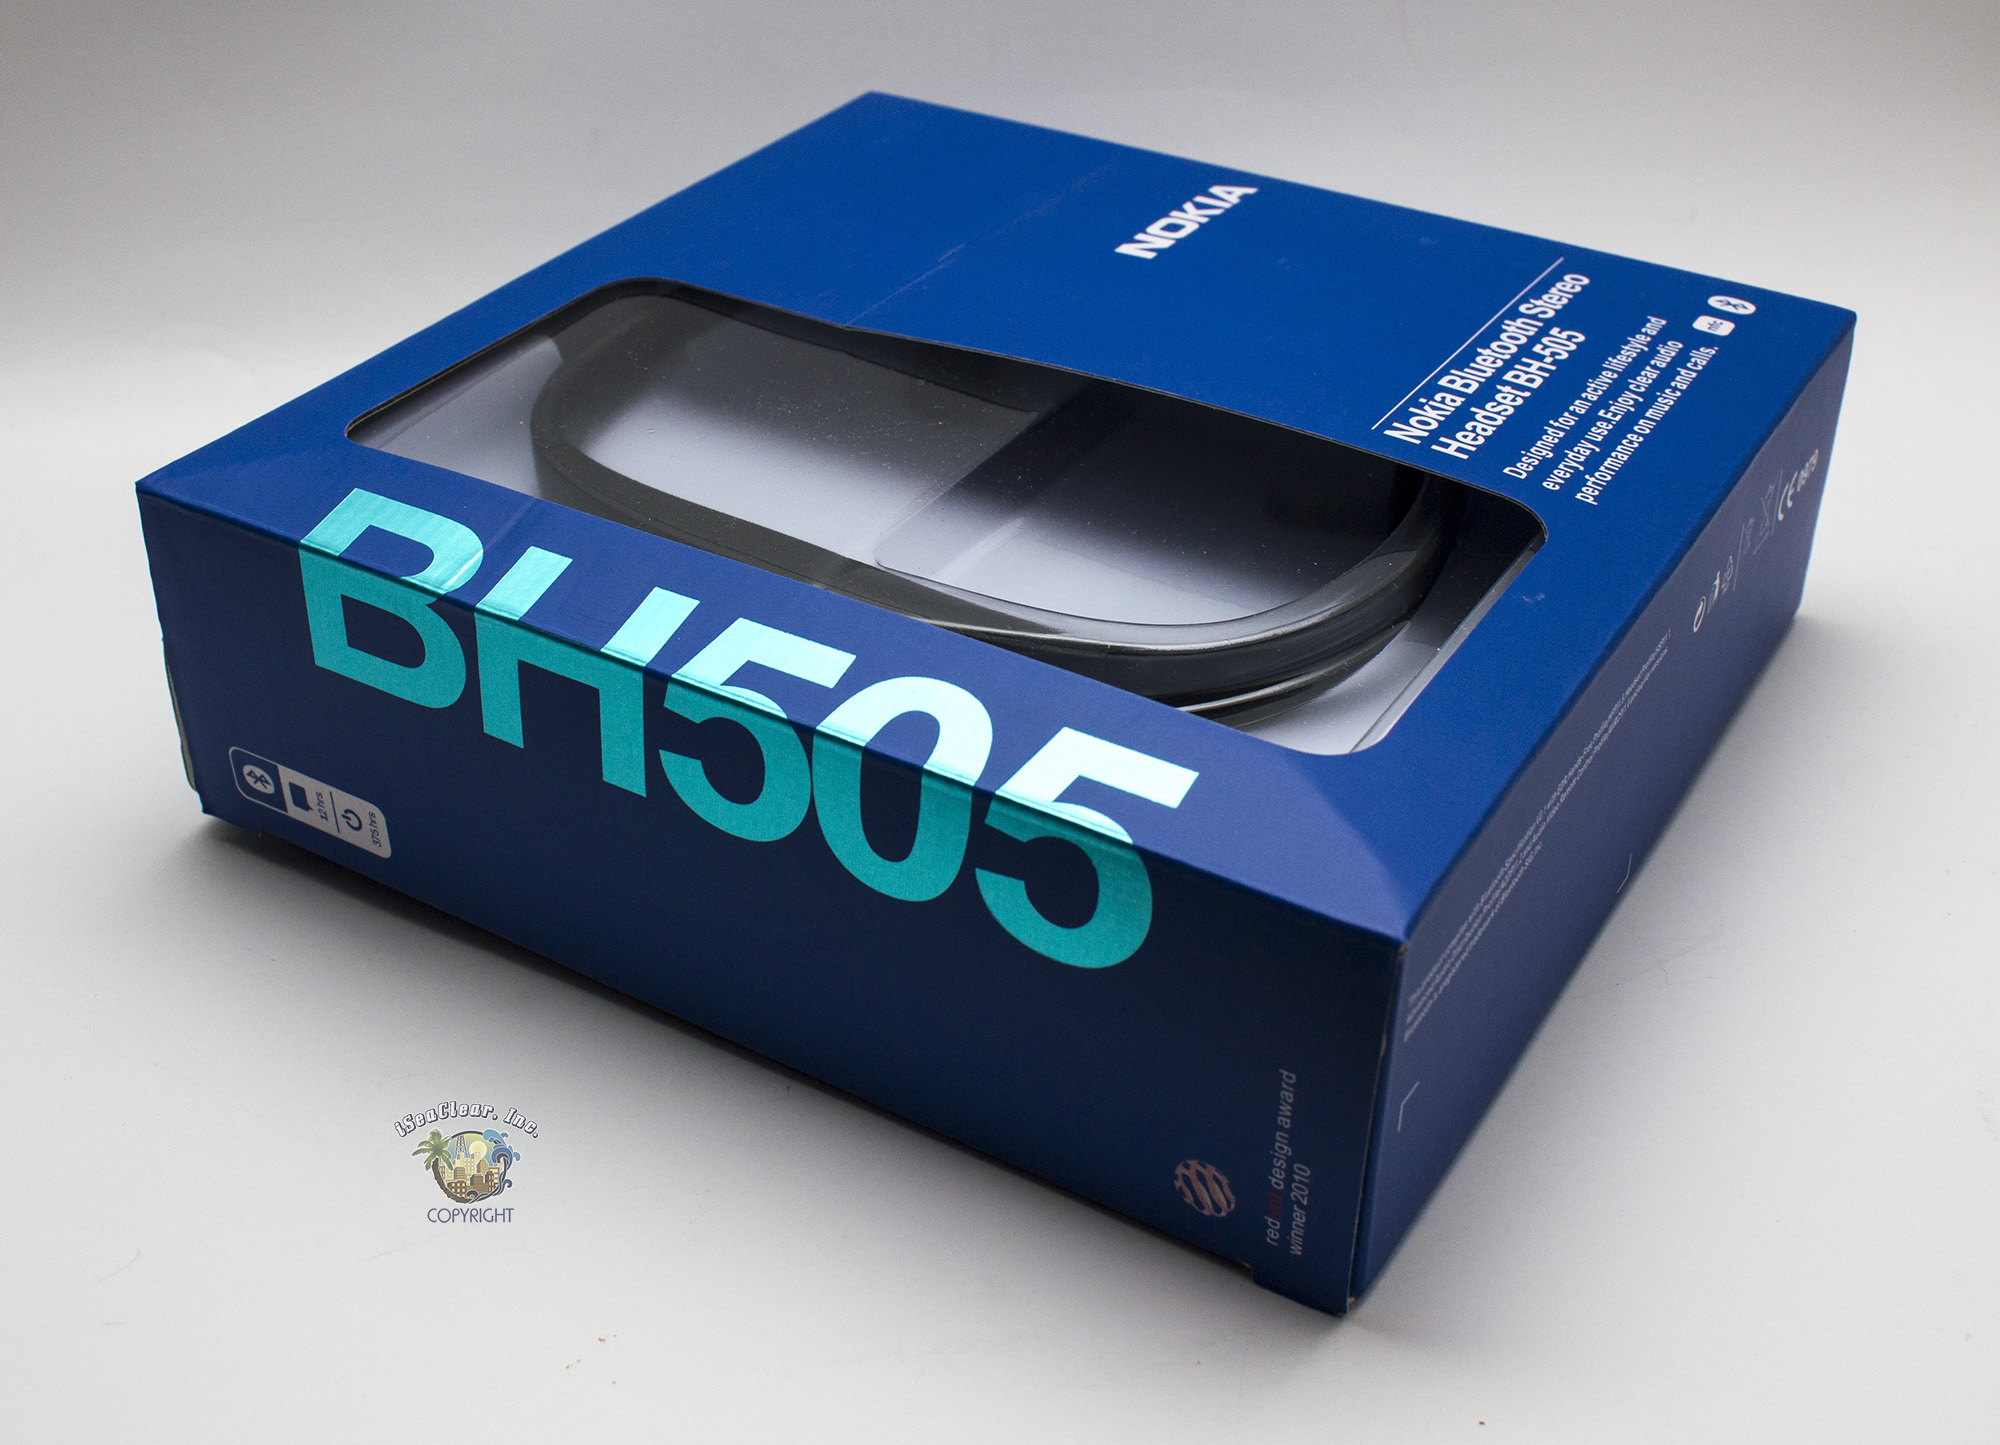 Nokia BH-505 Bluetooth Headset